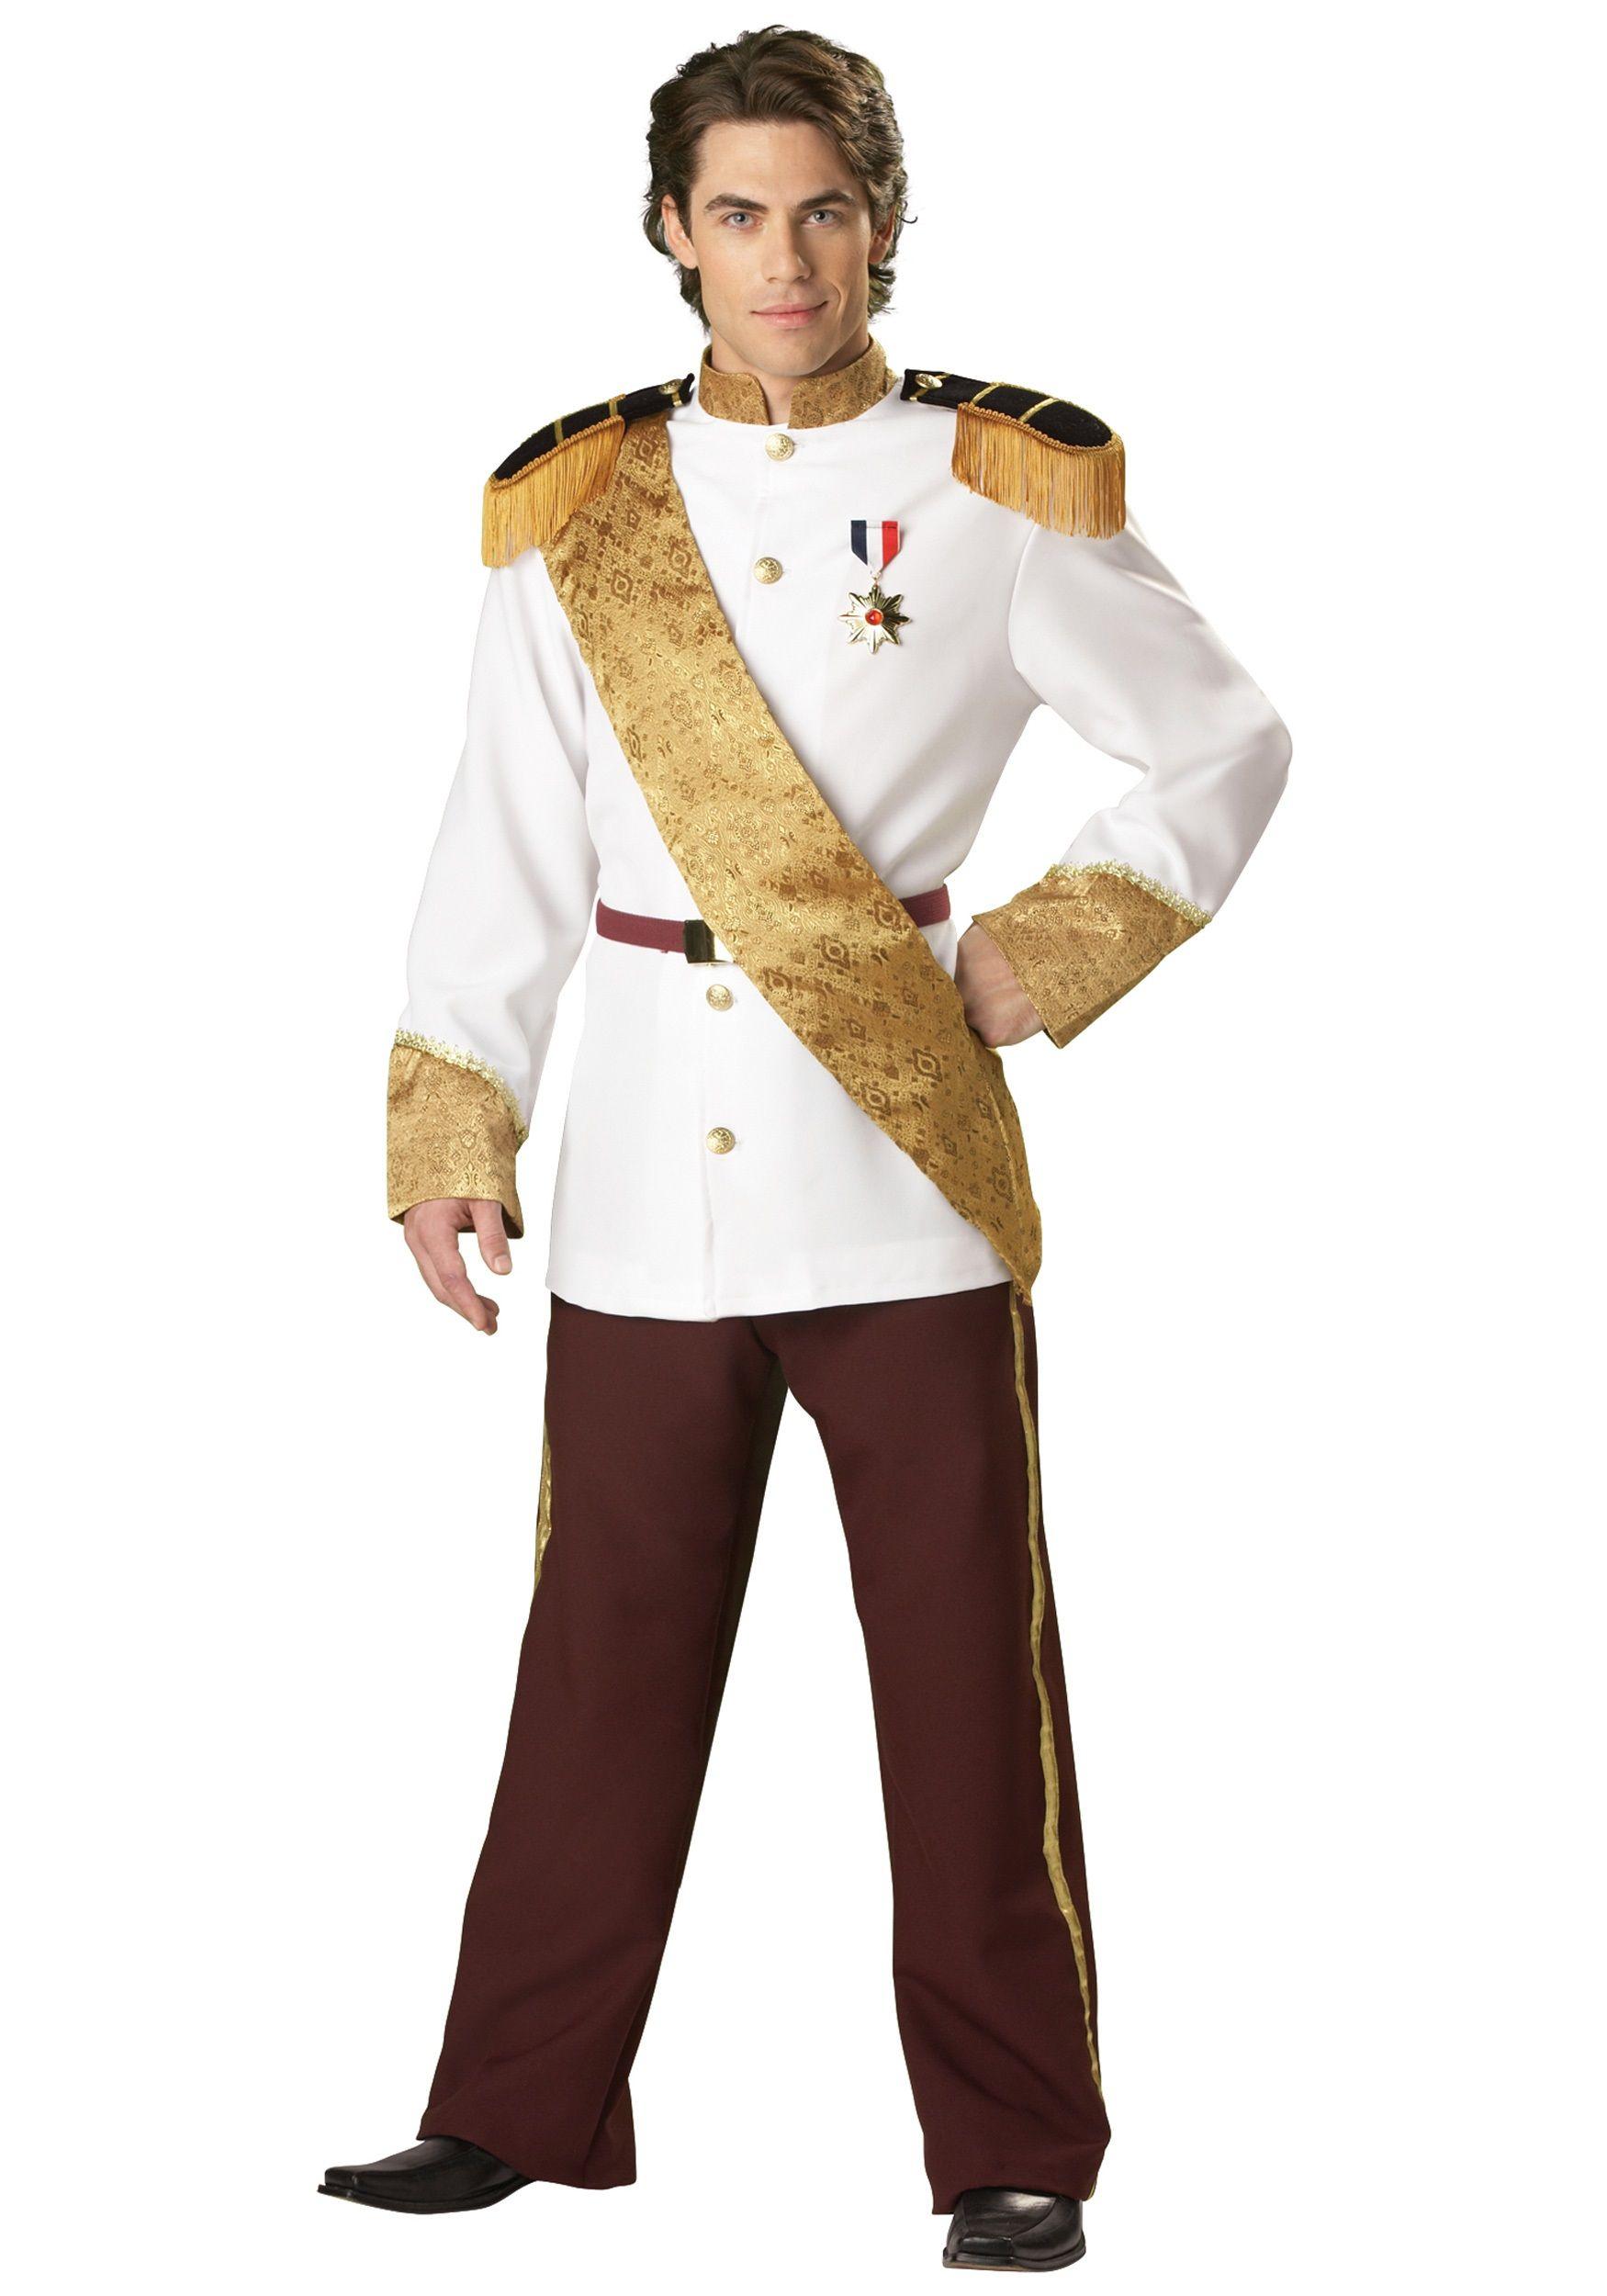 Elite Prince Charming Costume   Prince charming costume, Costumes ...